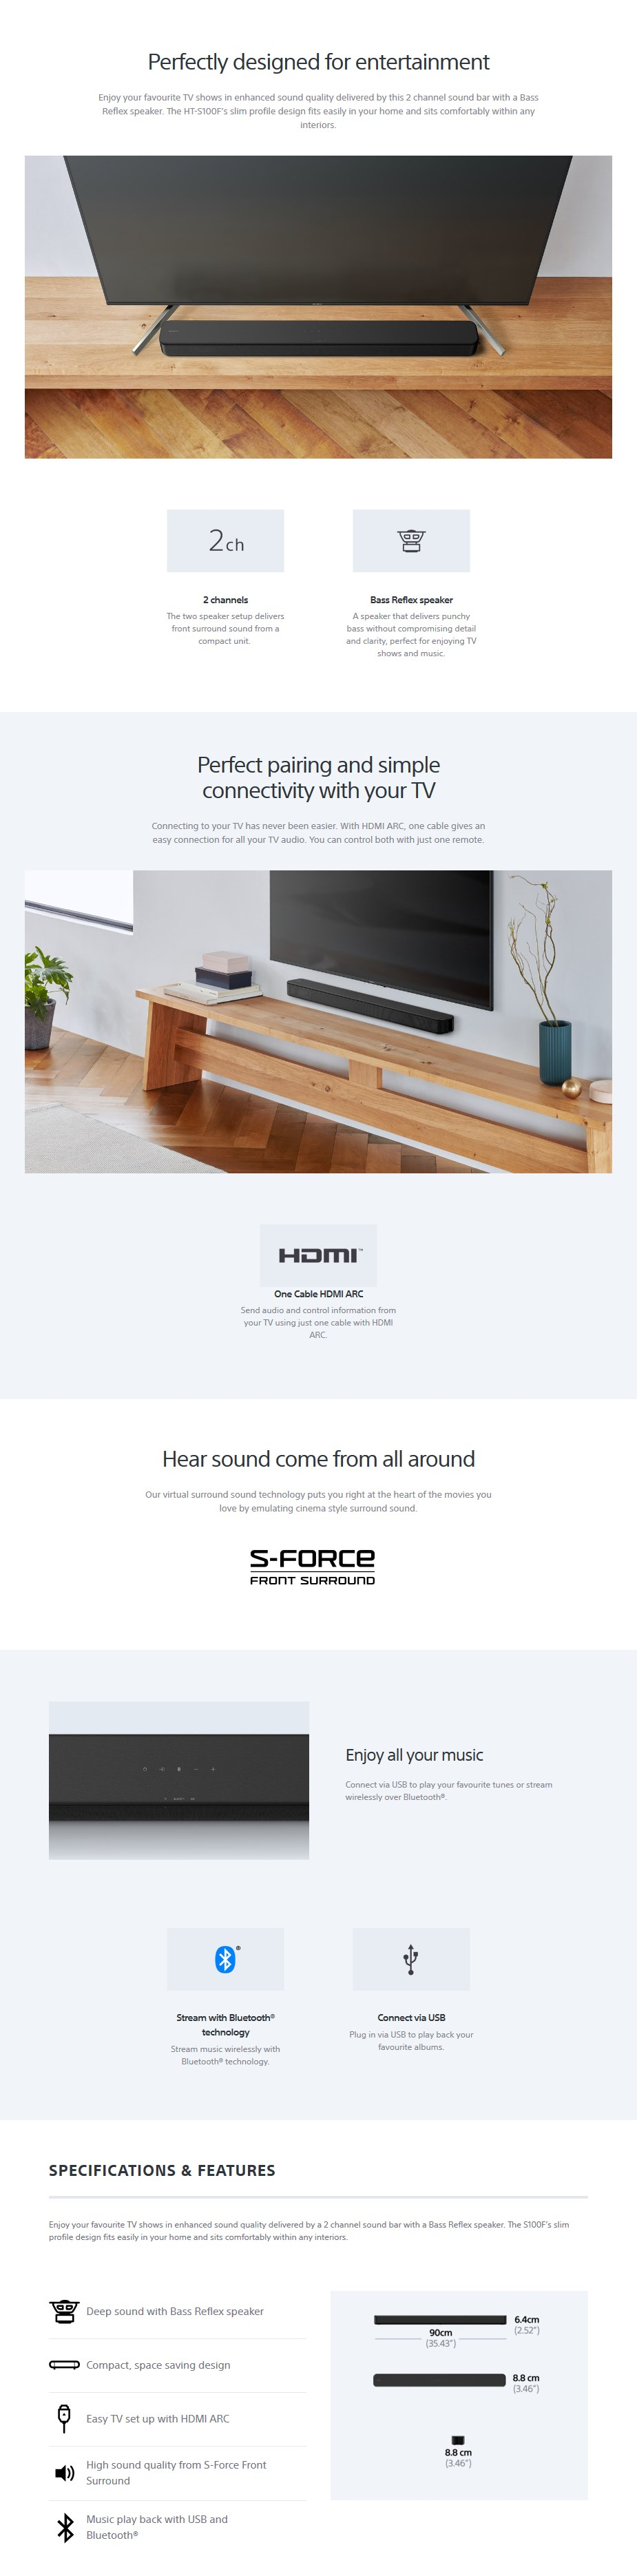 Sony HT-S100F 2.0 Compact Bluetooth Soundbar - Desktop Overview 1